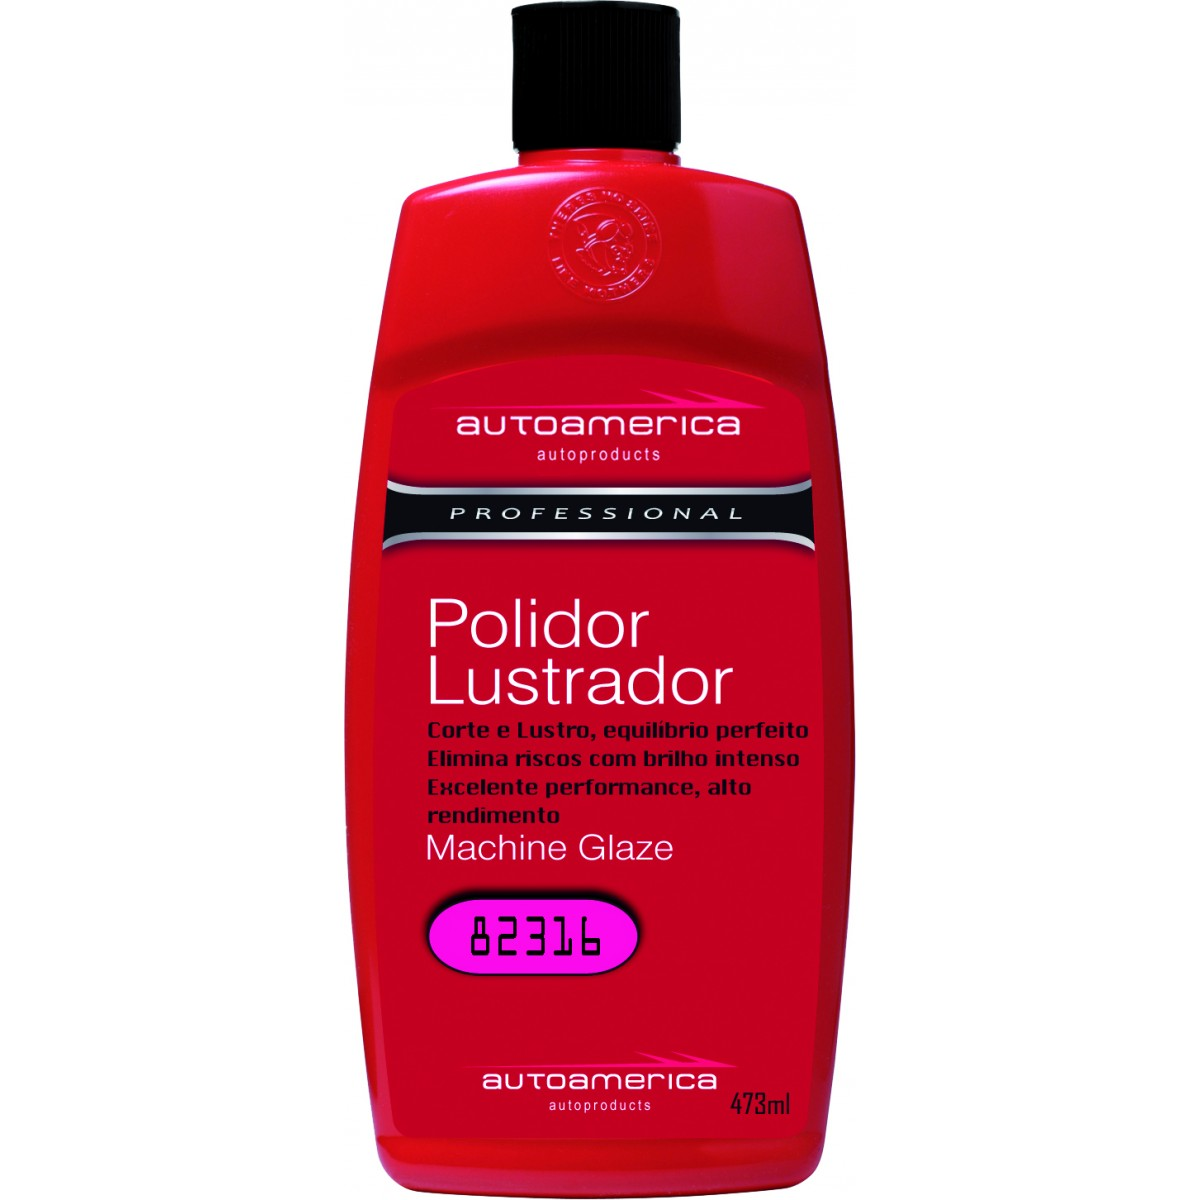 Polidor Lustrador Machine Glaze 473ml Mothers